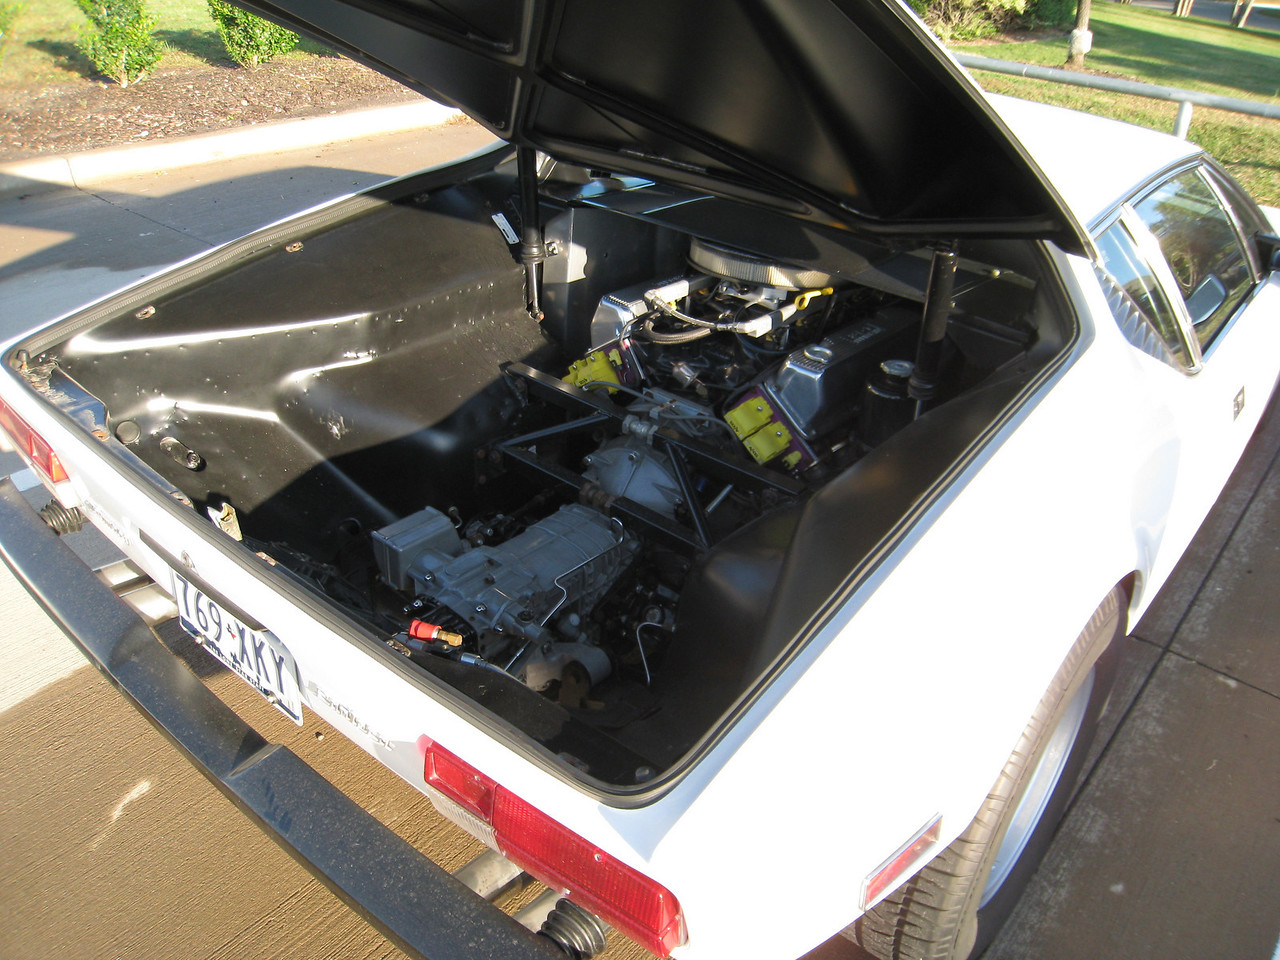 DeTomaso Pantera engine